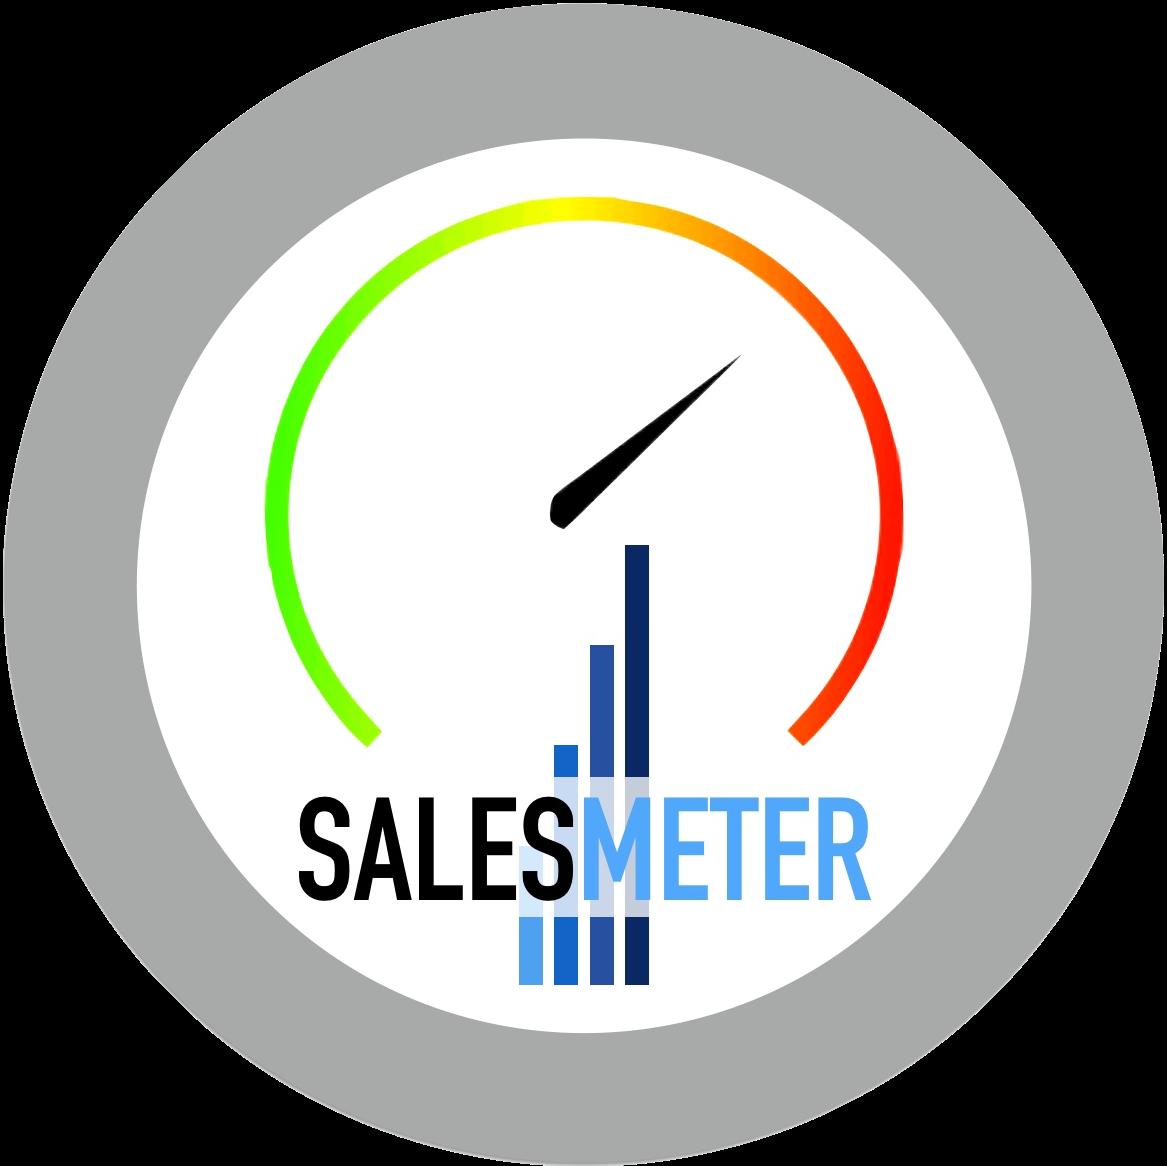 ESAthumbcircle-SalesMeter